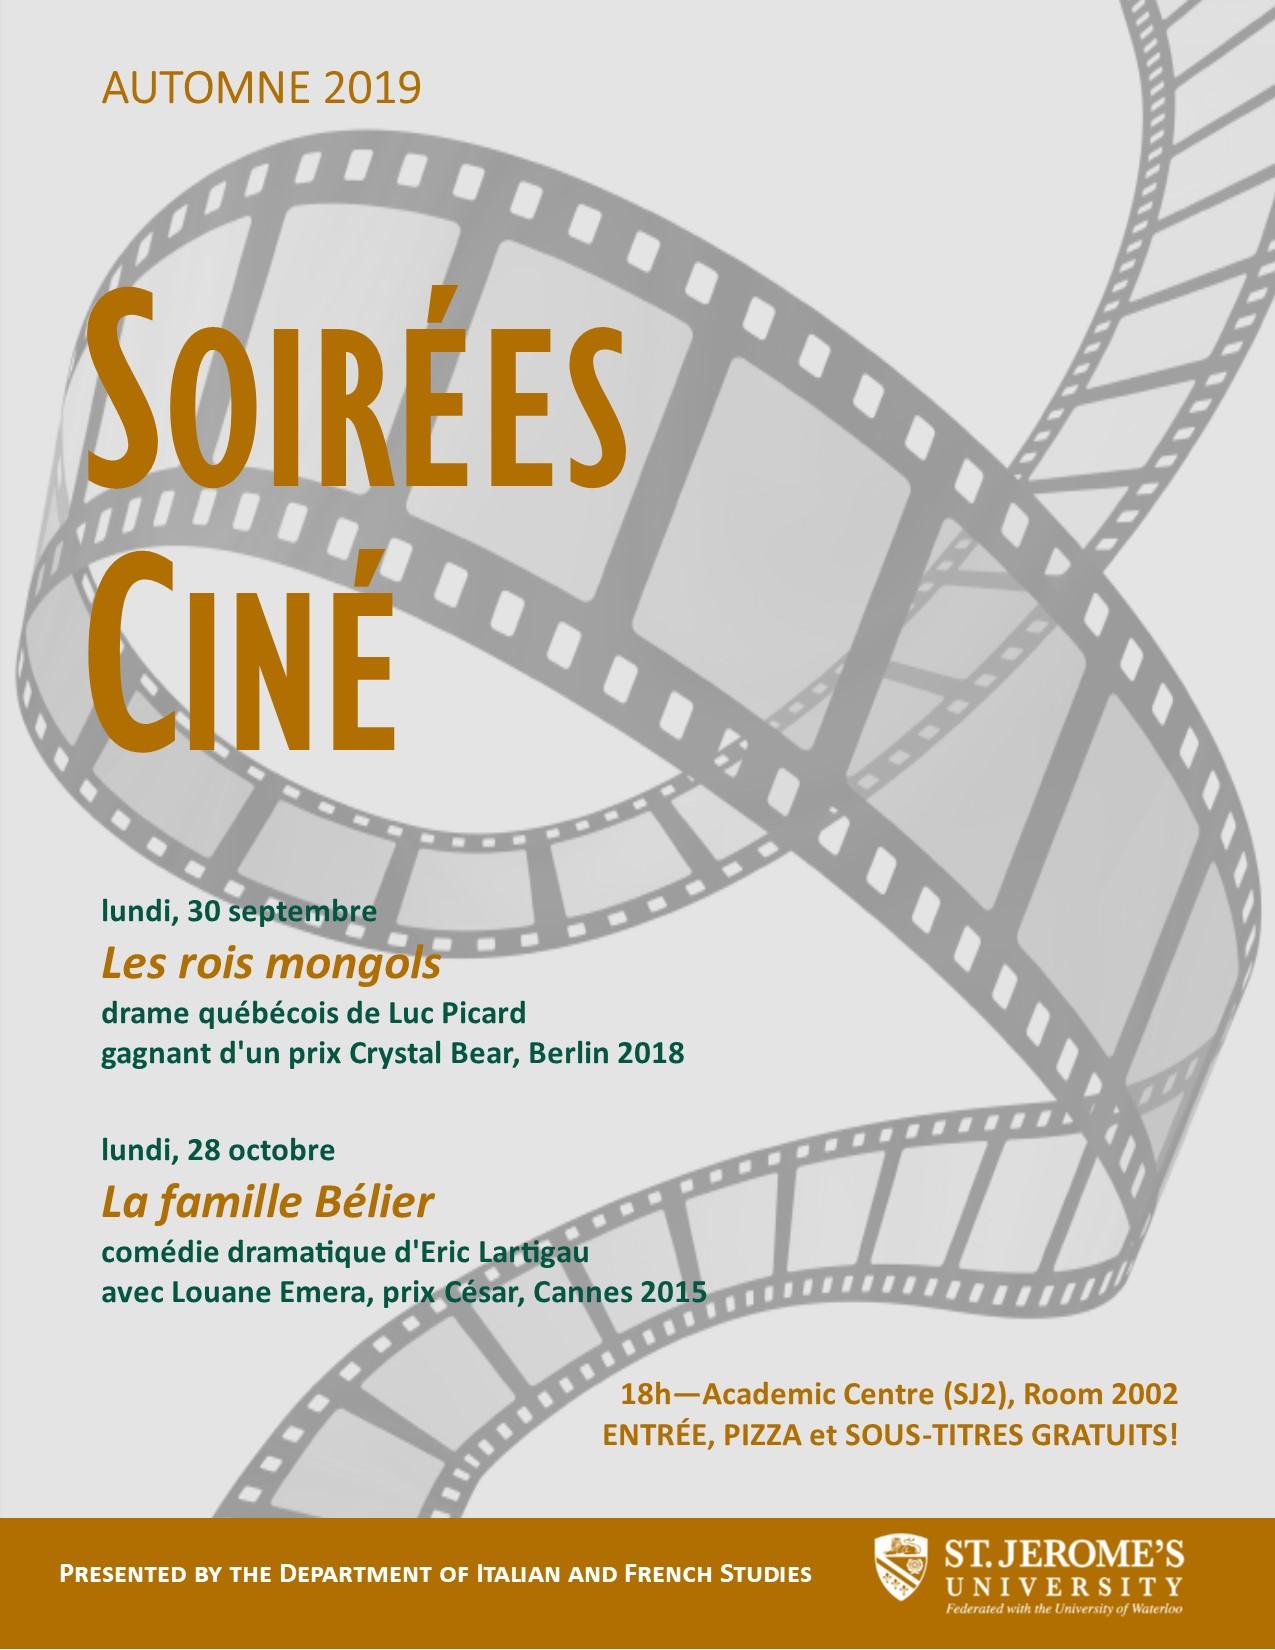 Soiree Cine Fall 2019